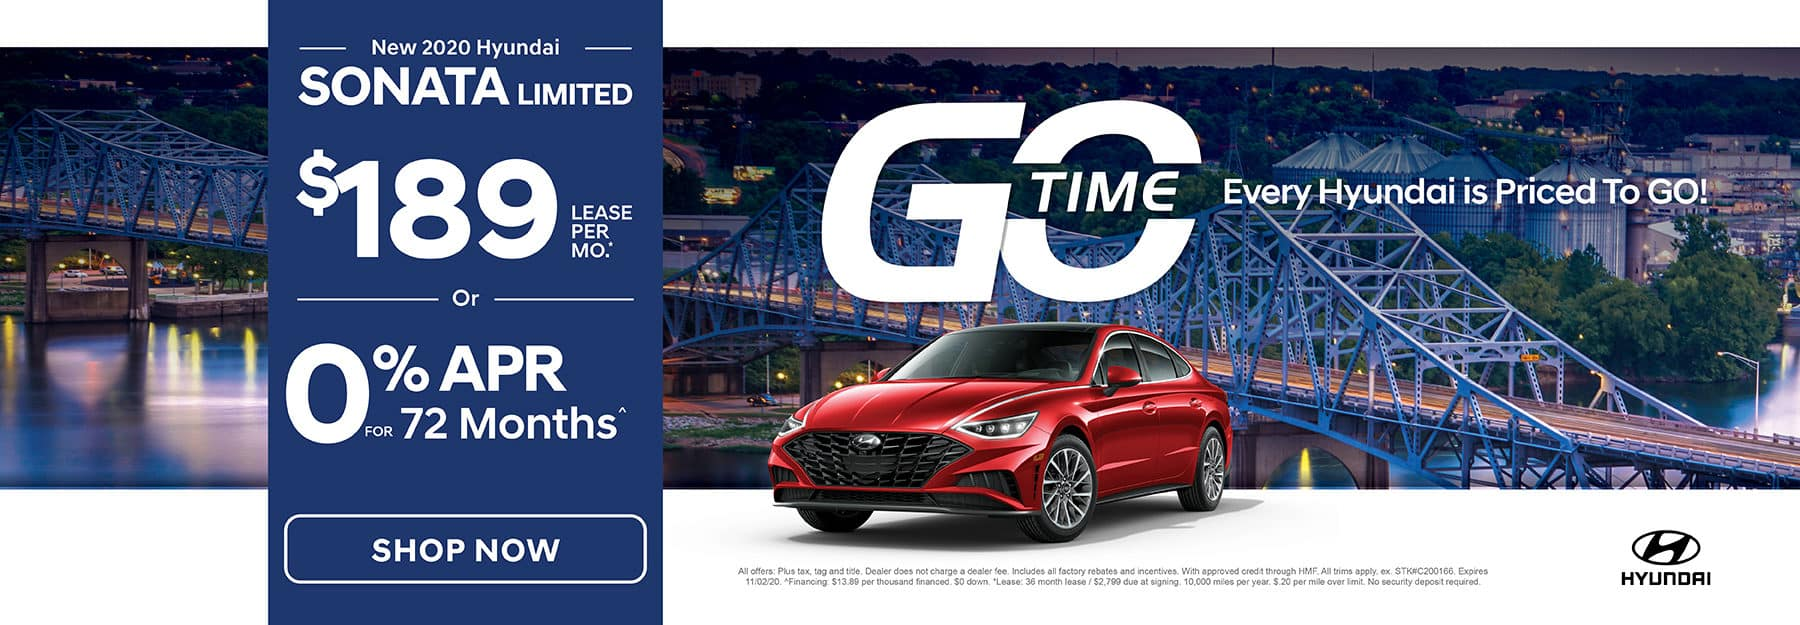 GO TIME - New 2020 Hyundai Sonata